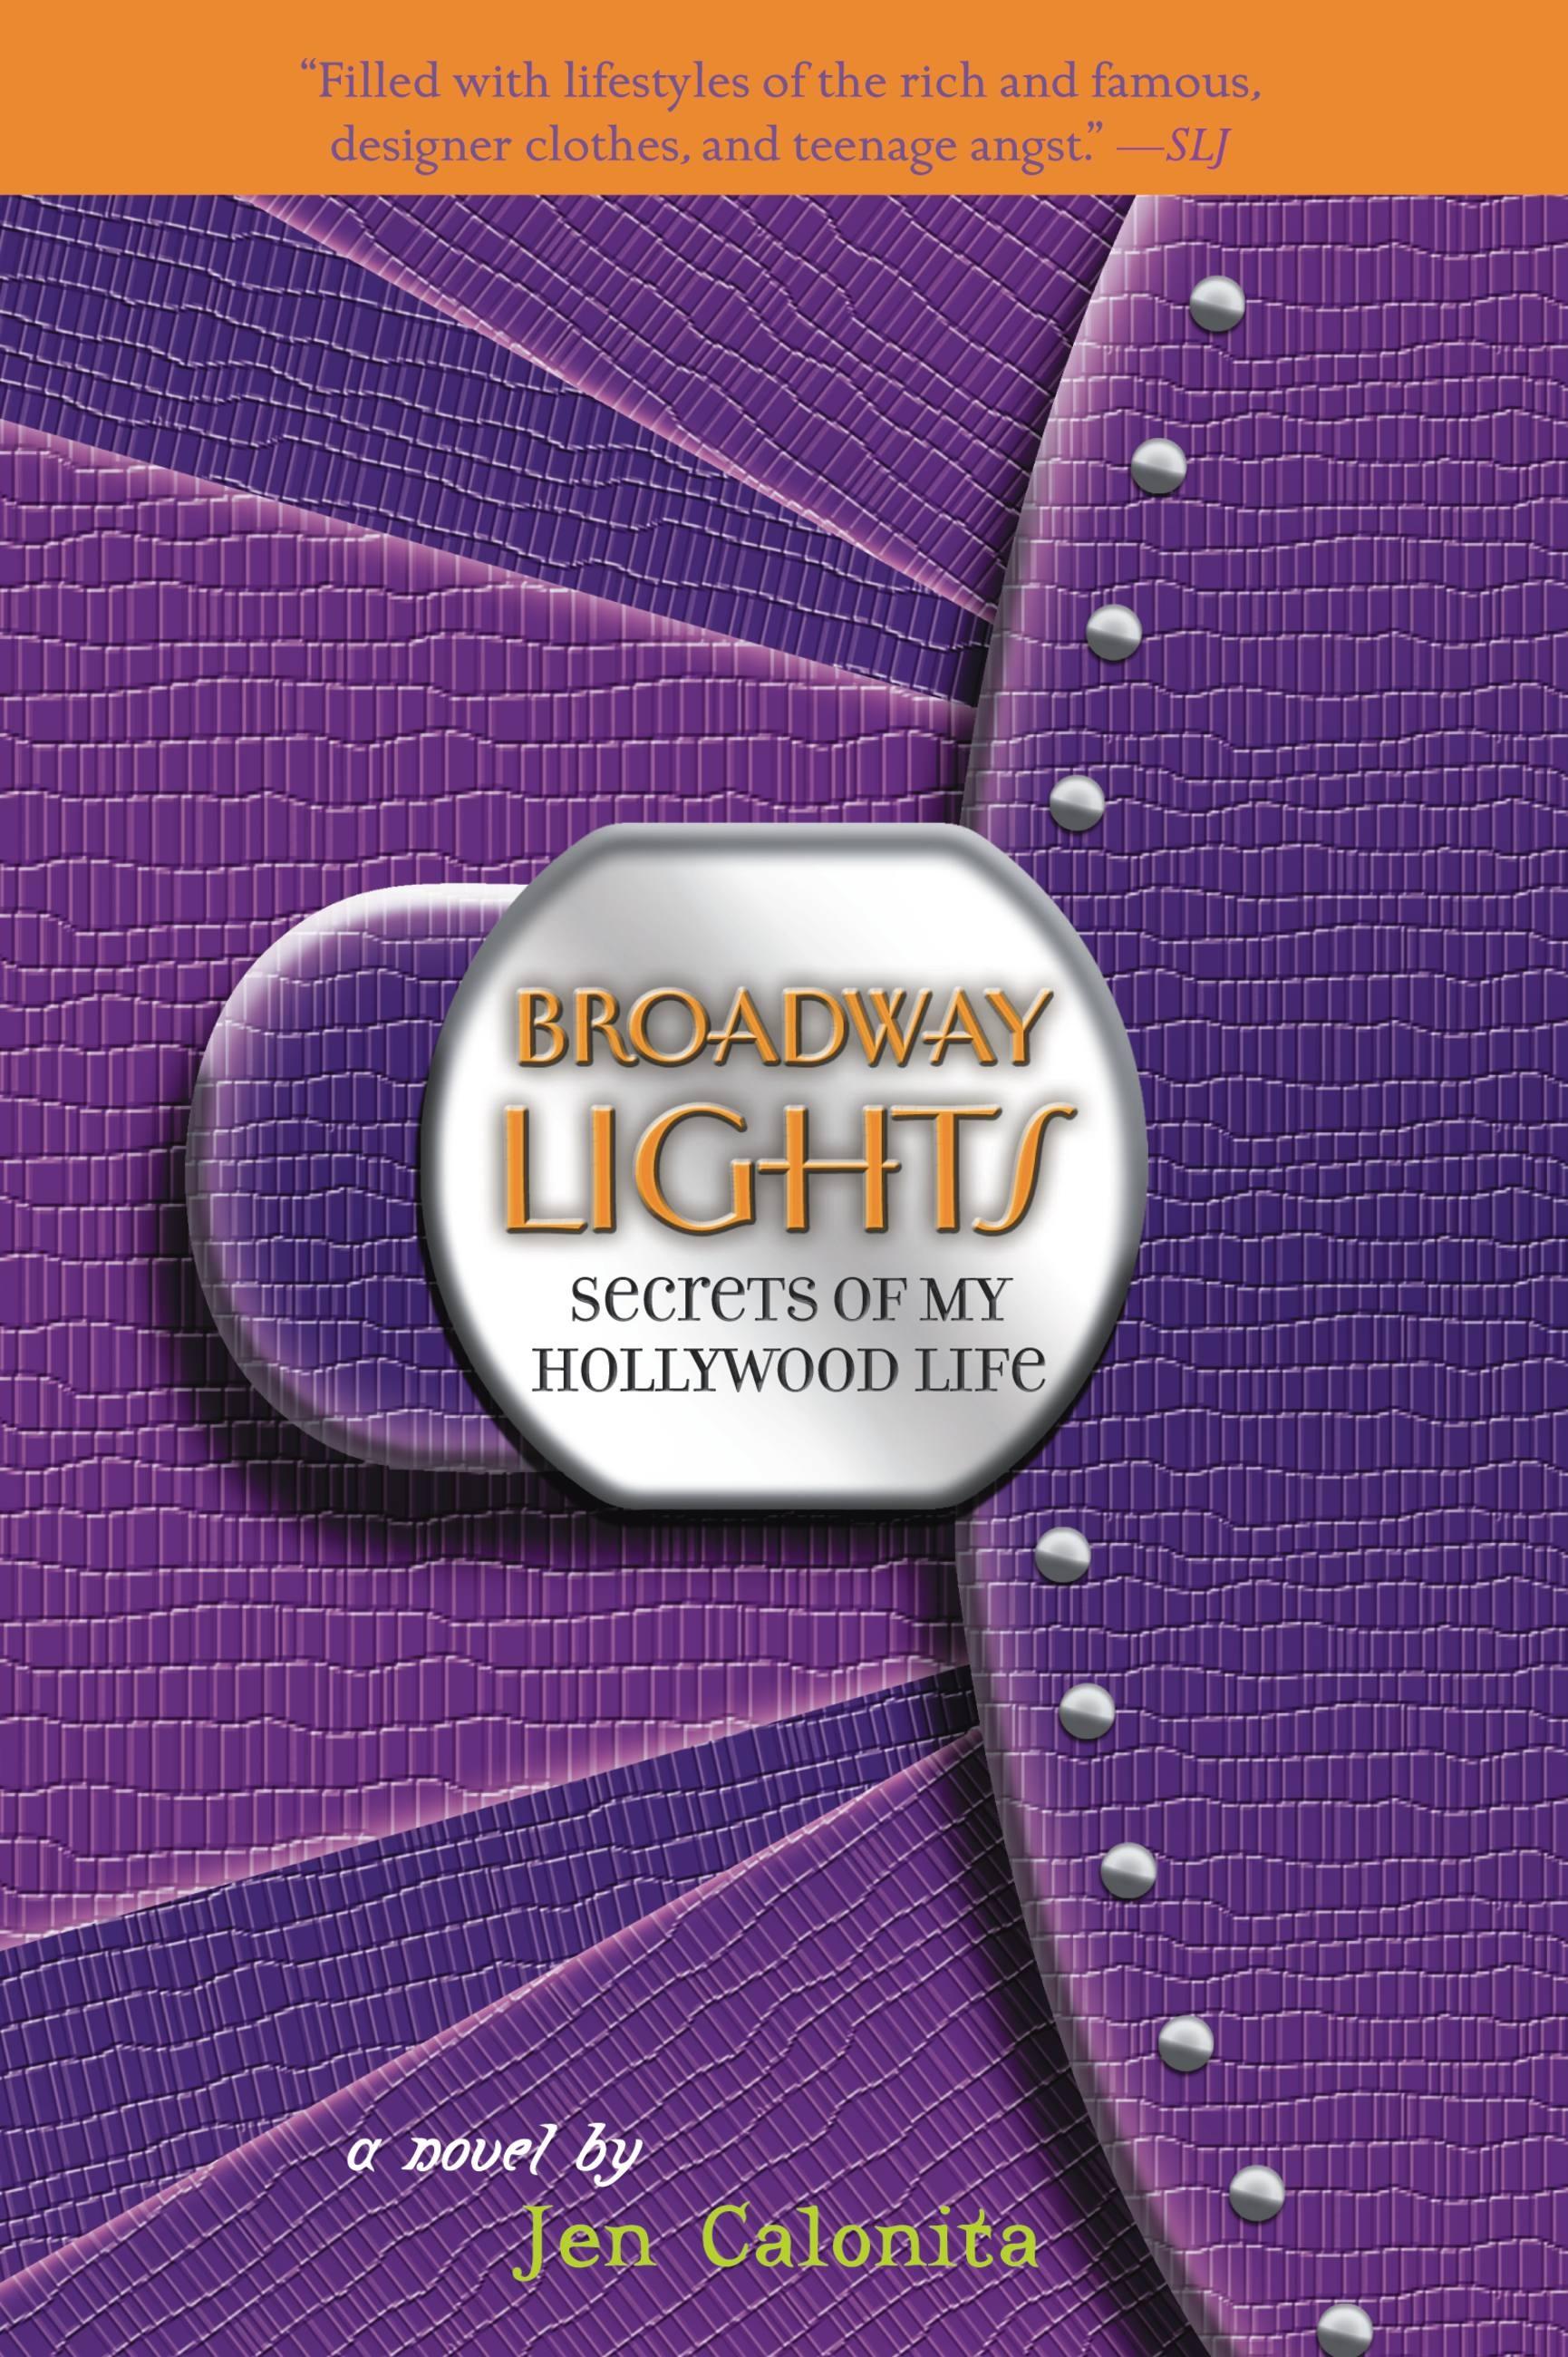 jen-calonita-broadway-lights.jpg